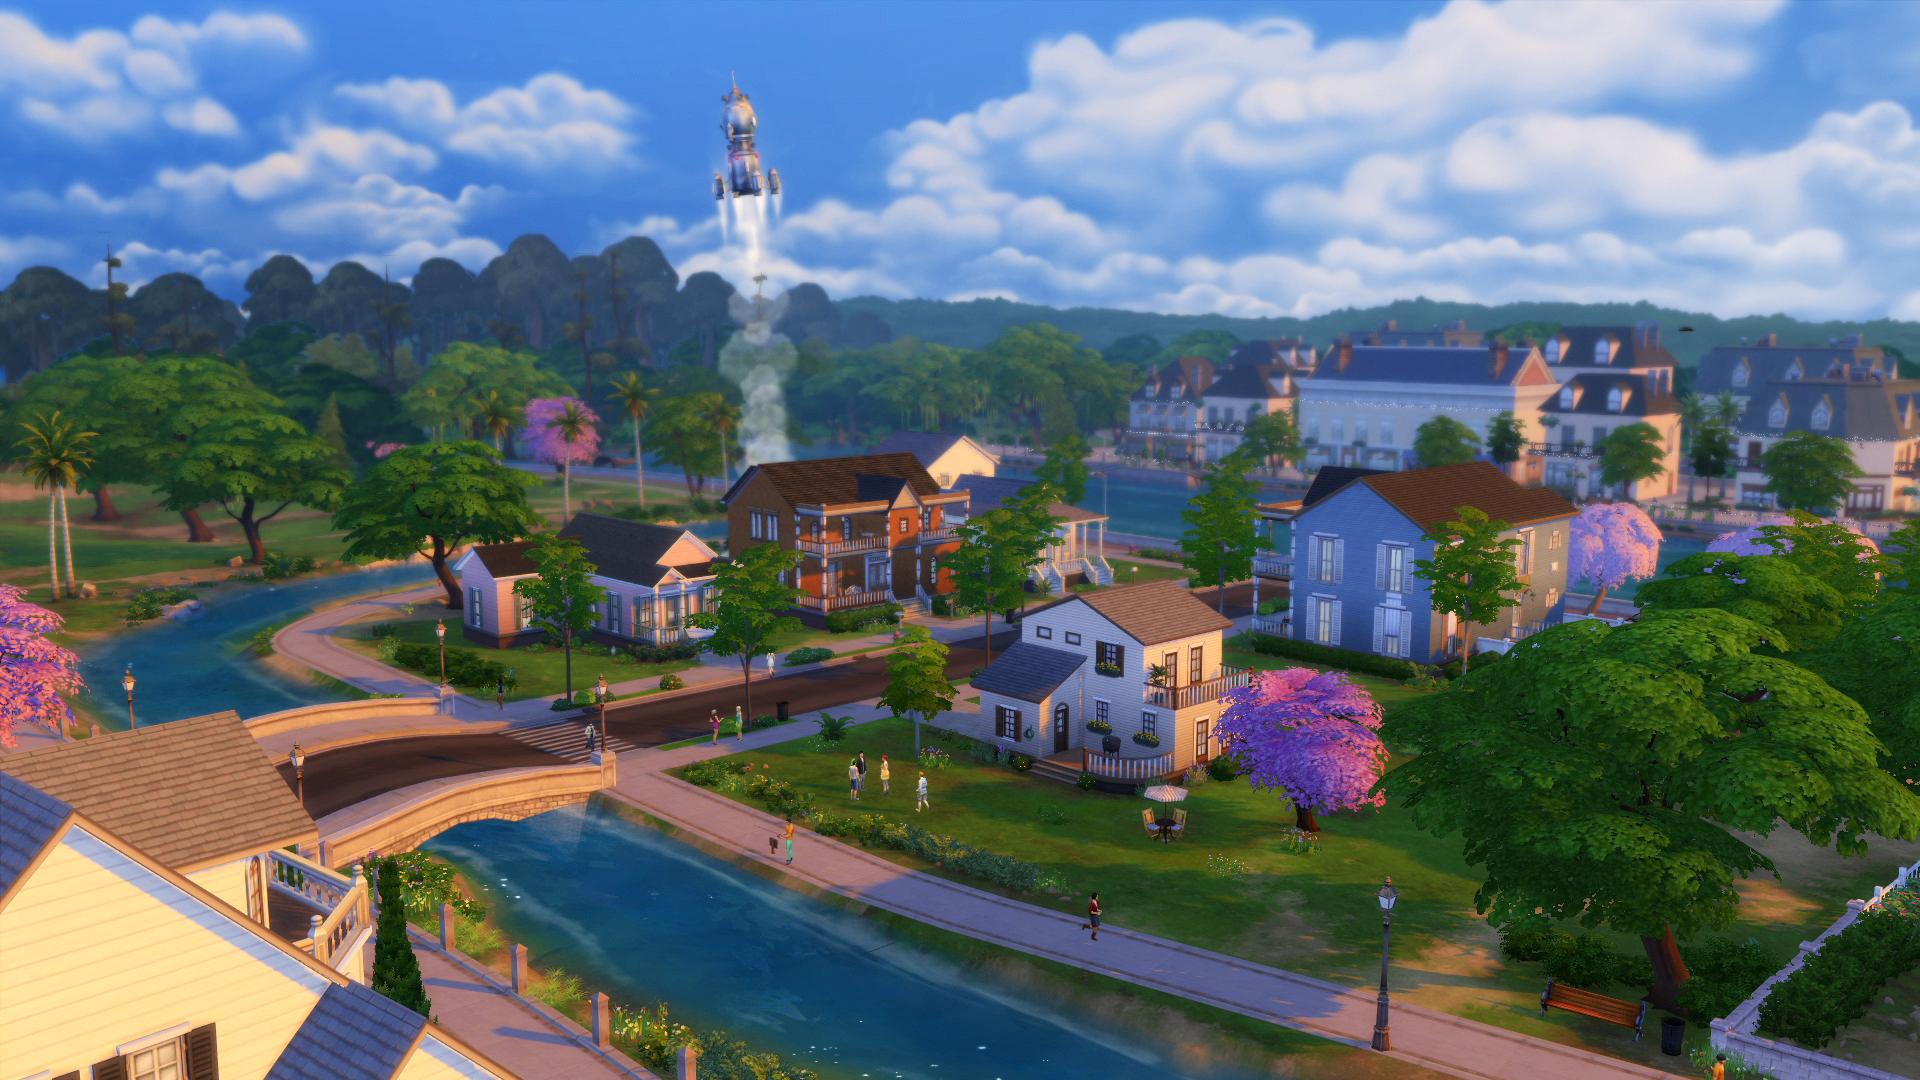 Favori The Sims 4 High Resolution Screenshots – simcitizens IB37